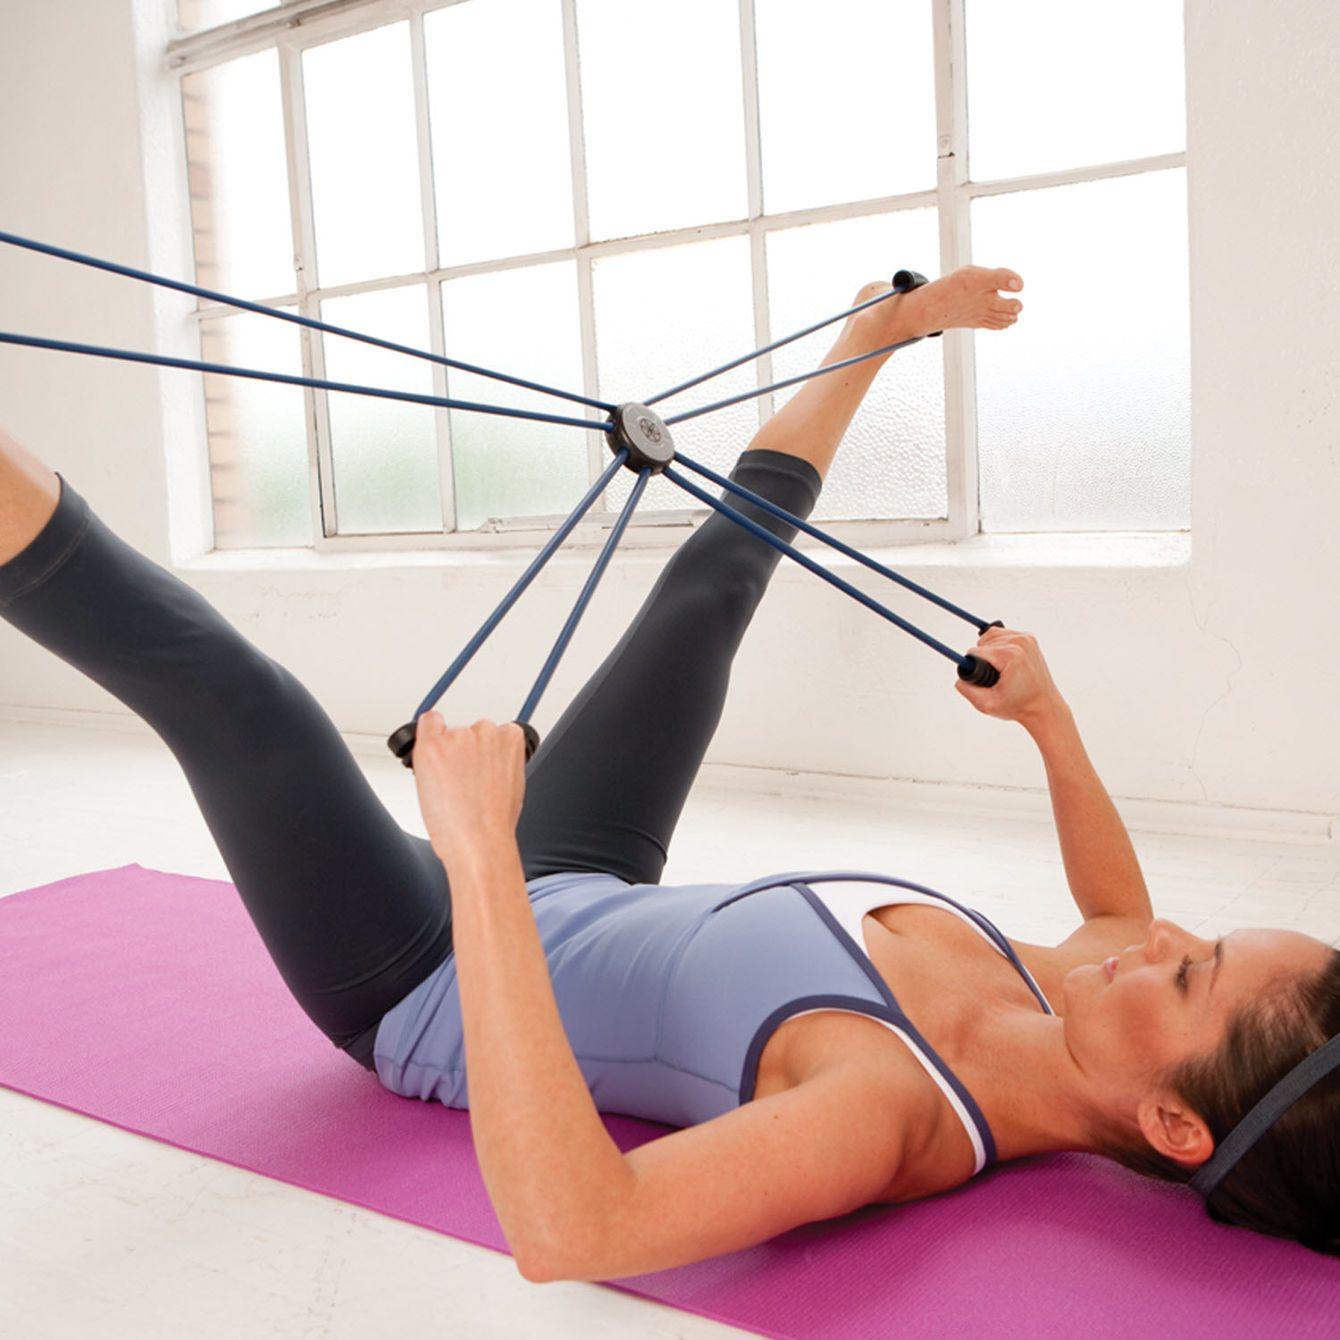 CorePlus Reformer   Pilates reformer, Resistance workout, Pilates ...